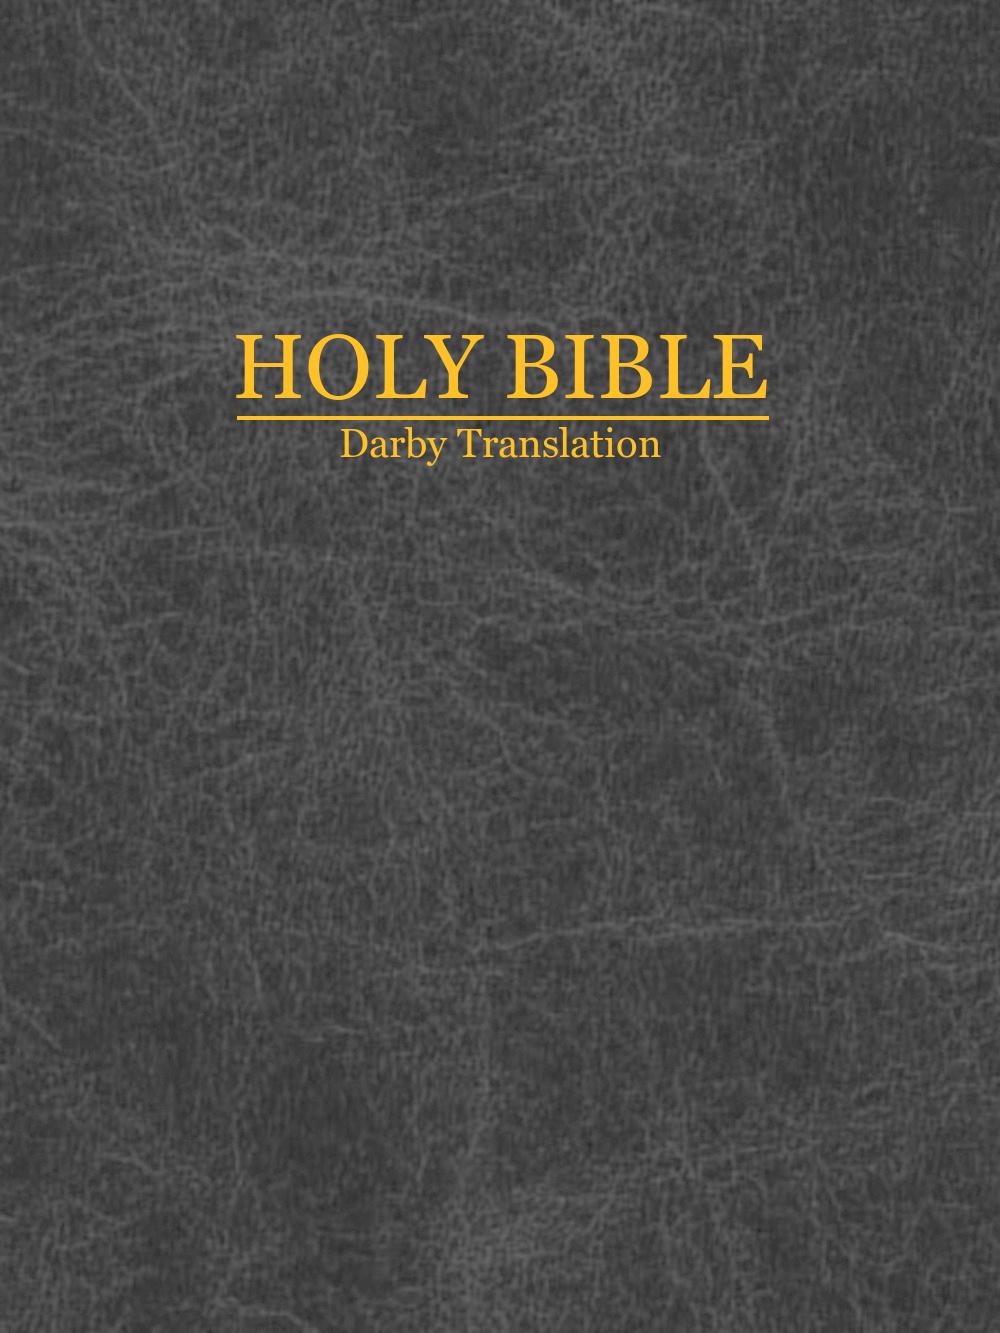 Holy Bible Darby Translation Christian Classics